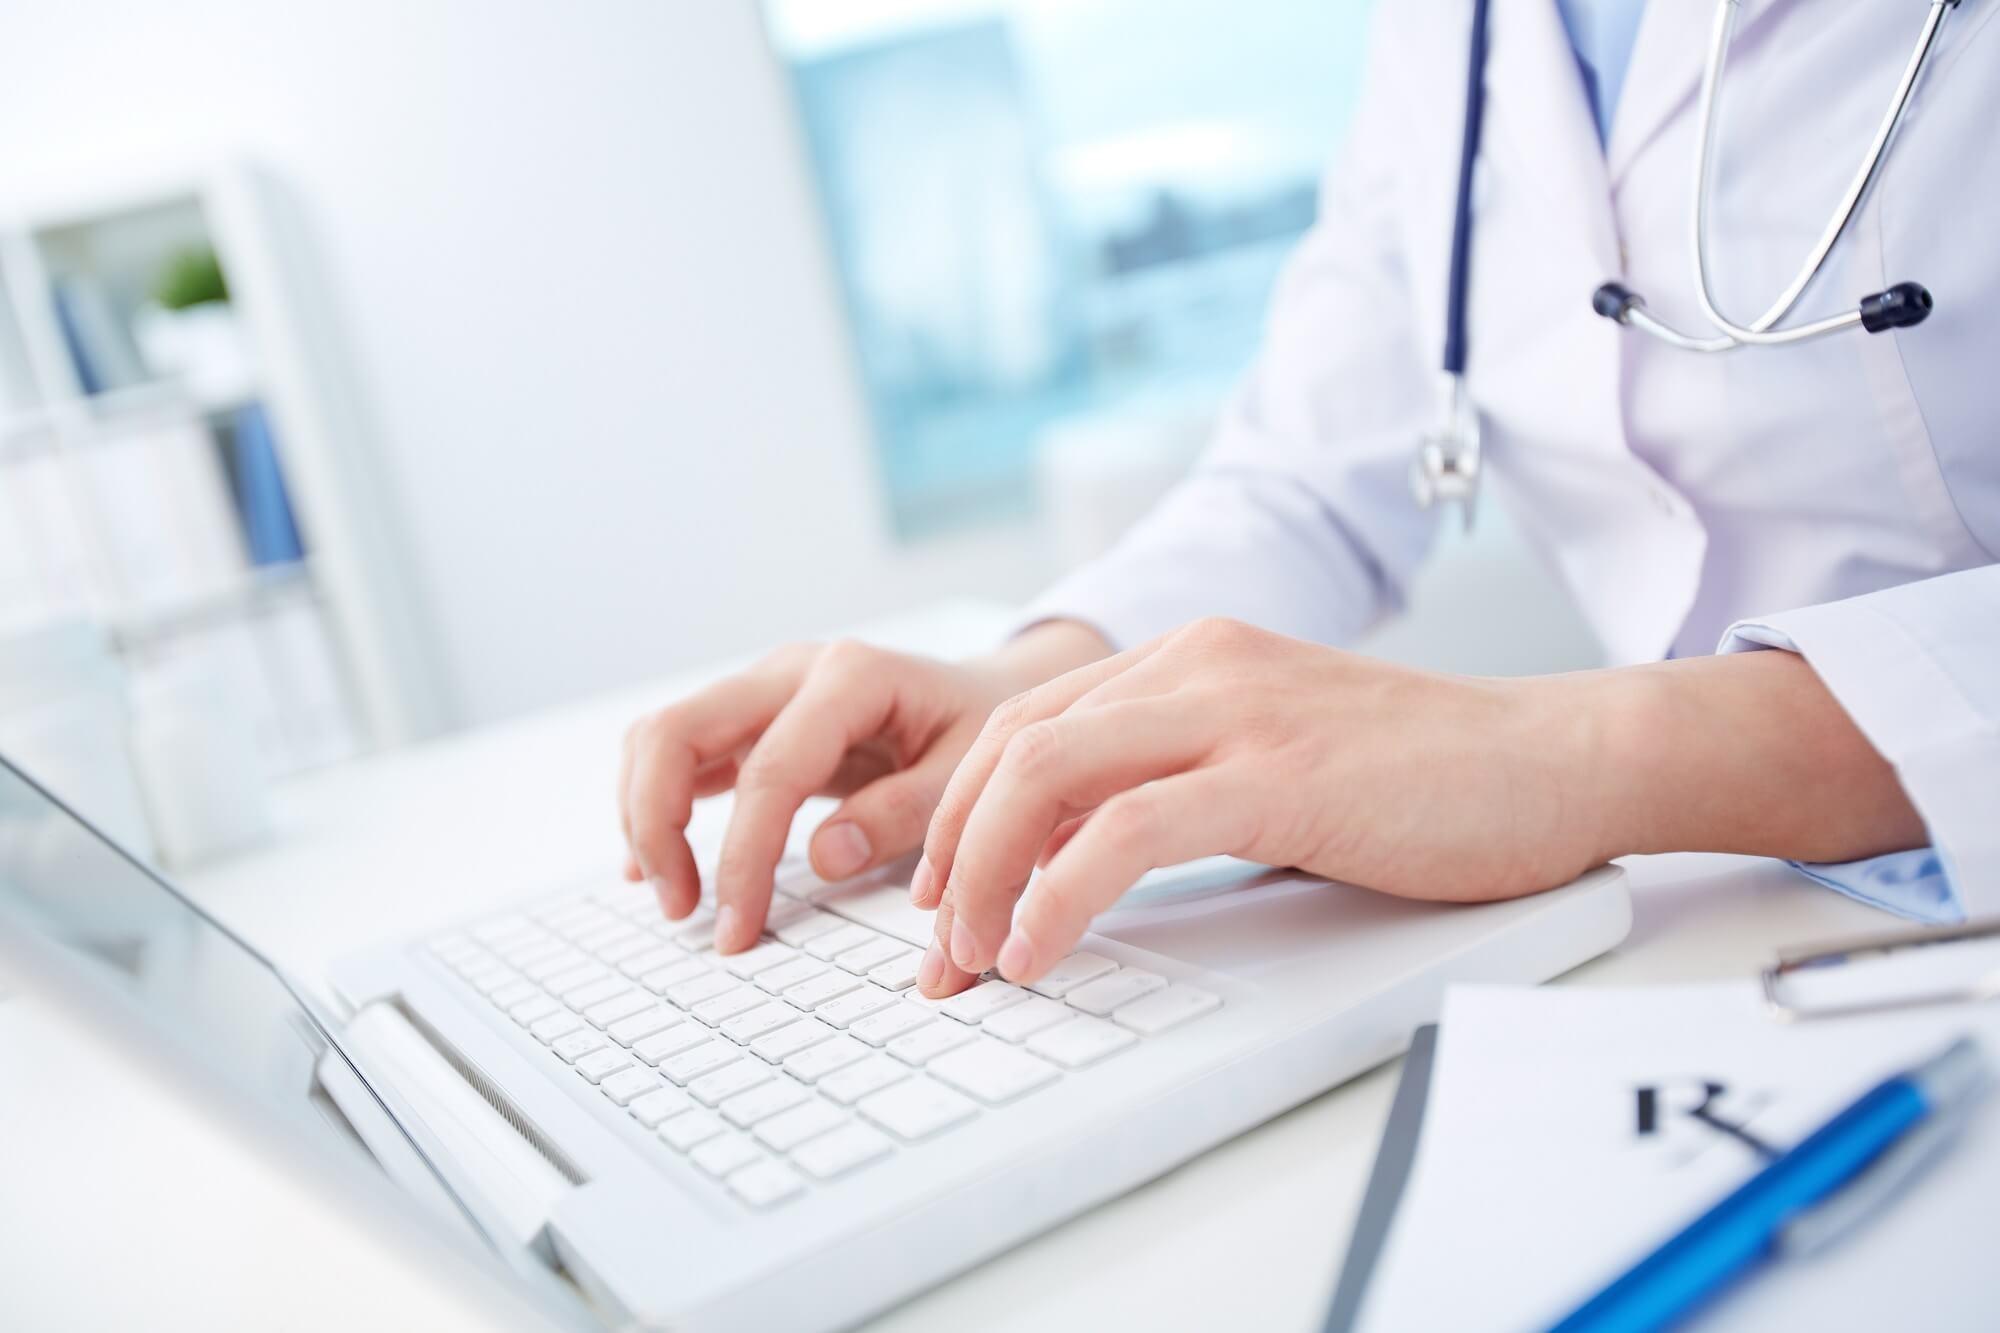 AHA Online Opioid Education Course Available